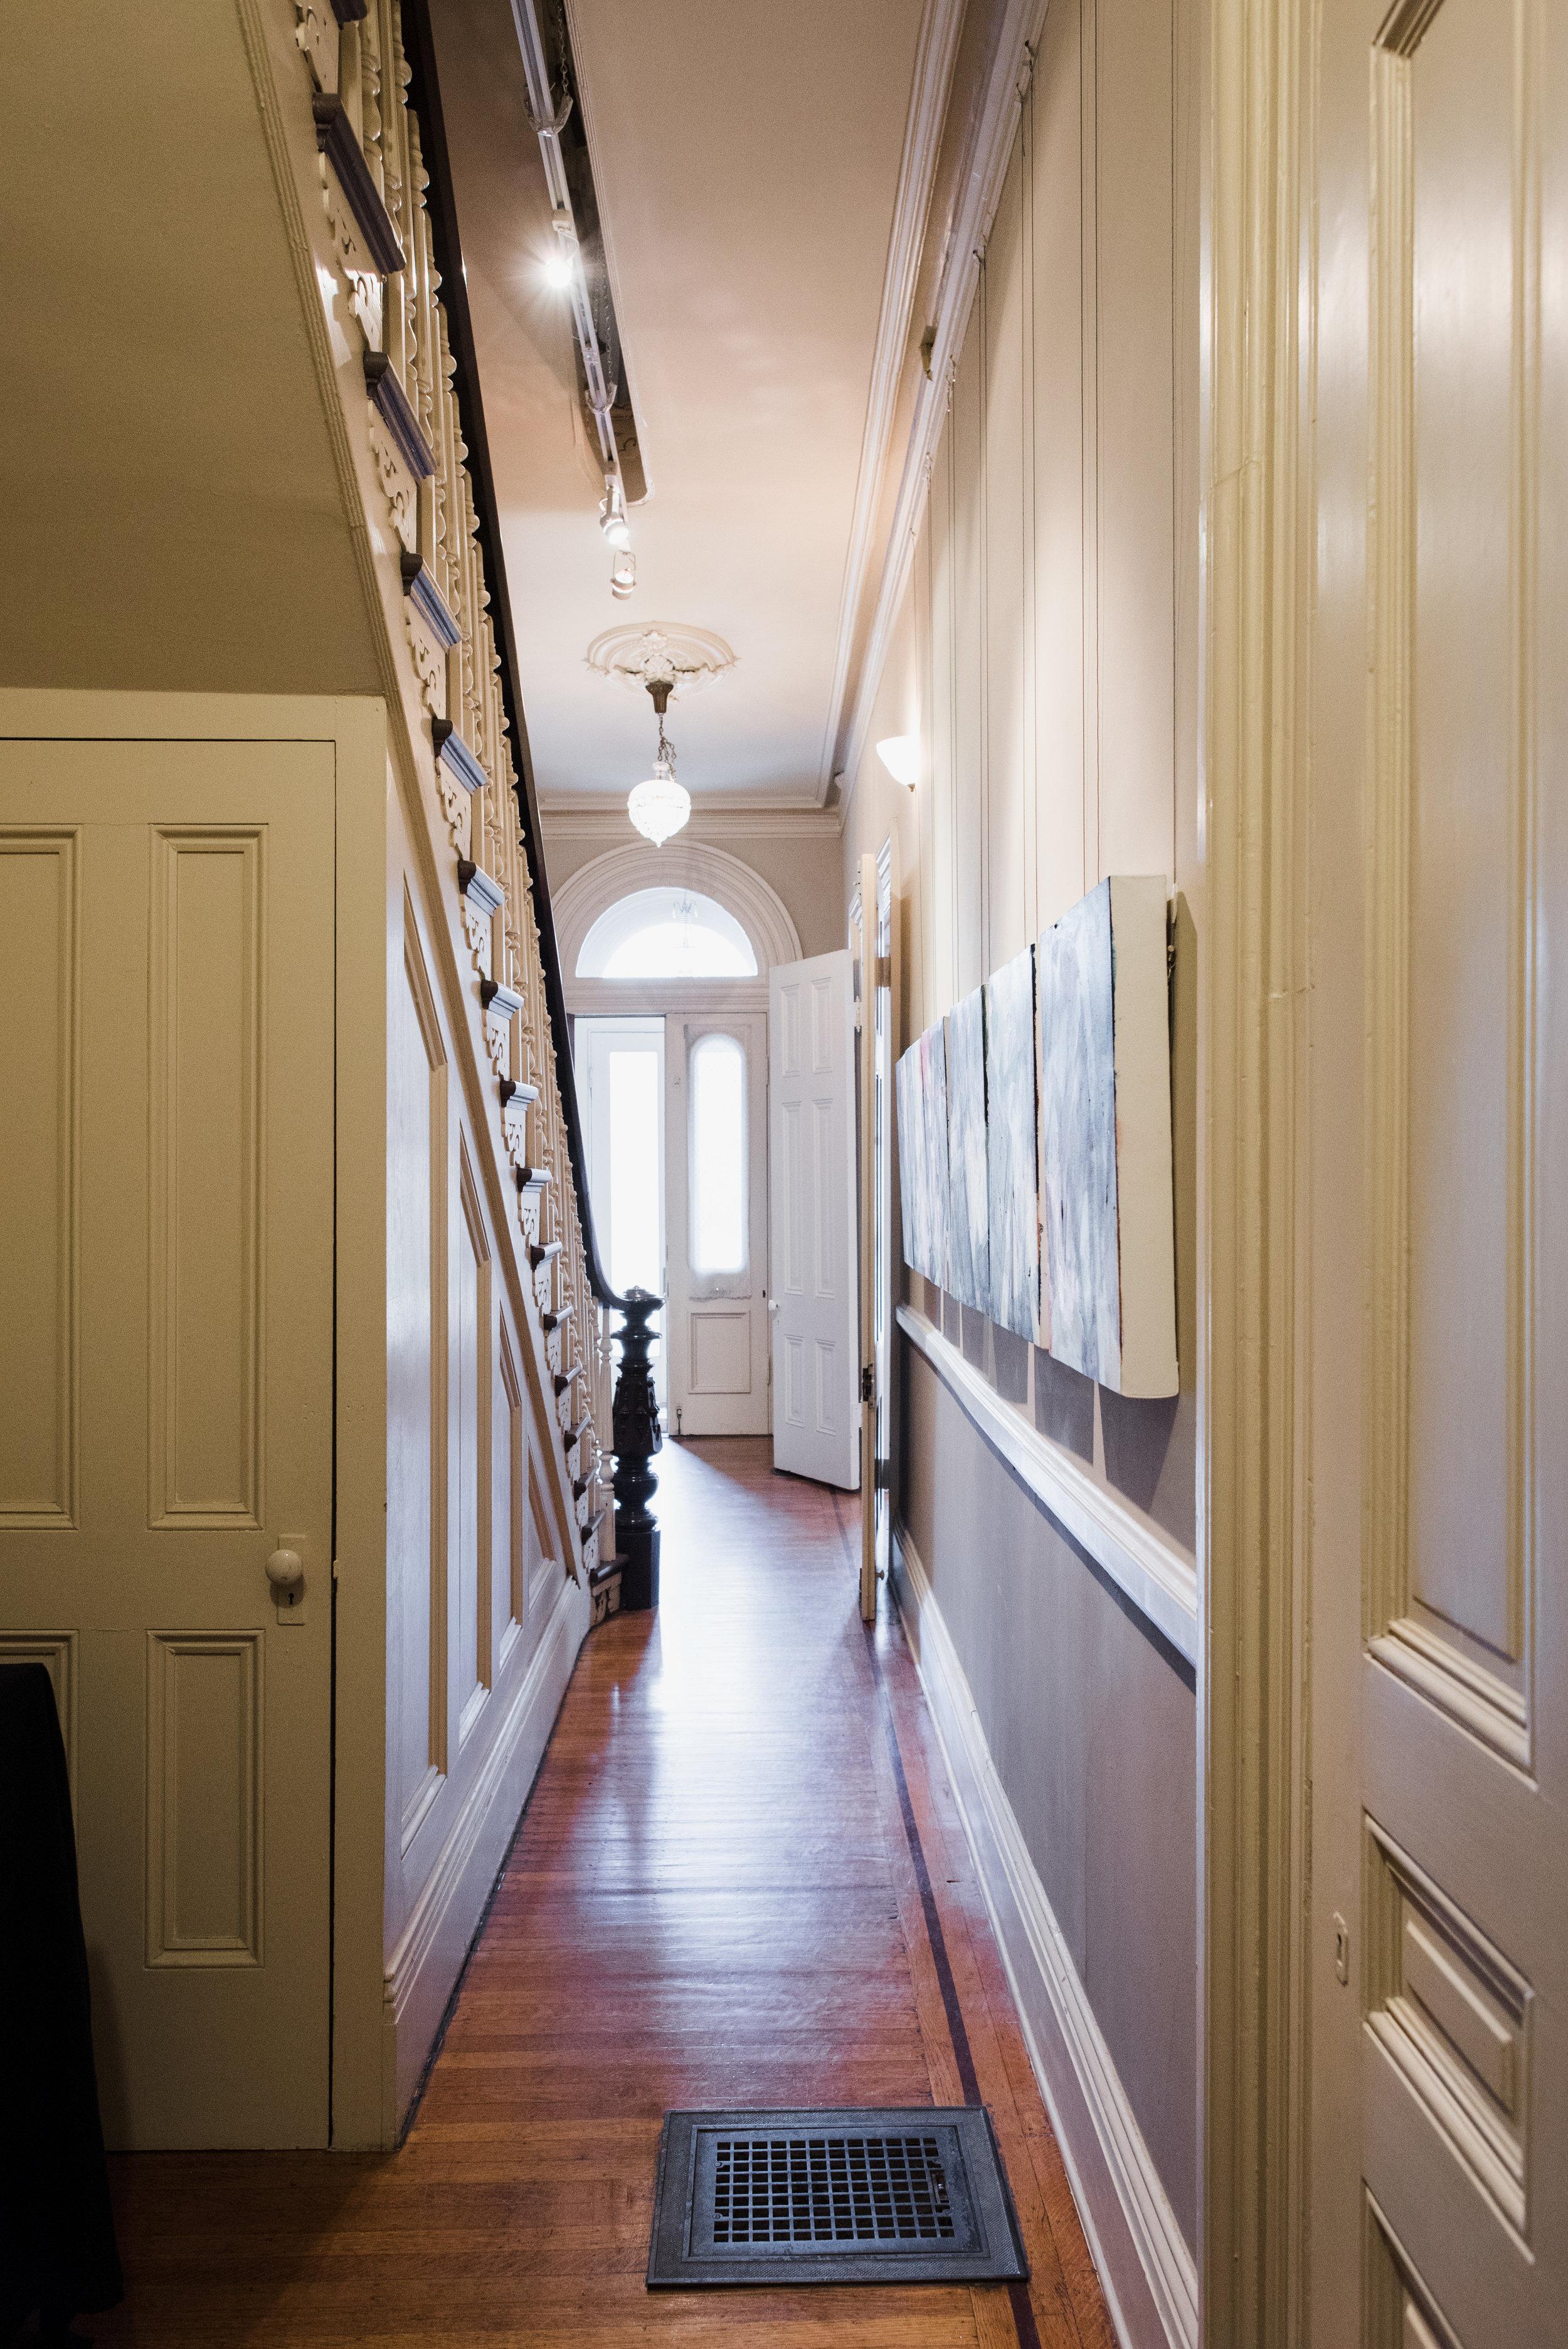 Katie Pumphrey Rearranging Rooms_Anna Reynal Photography-18.jpg